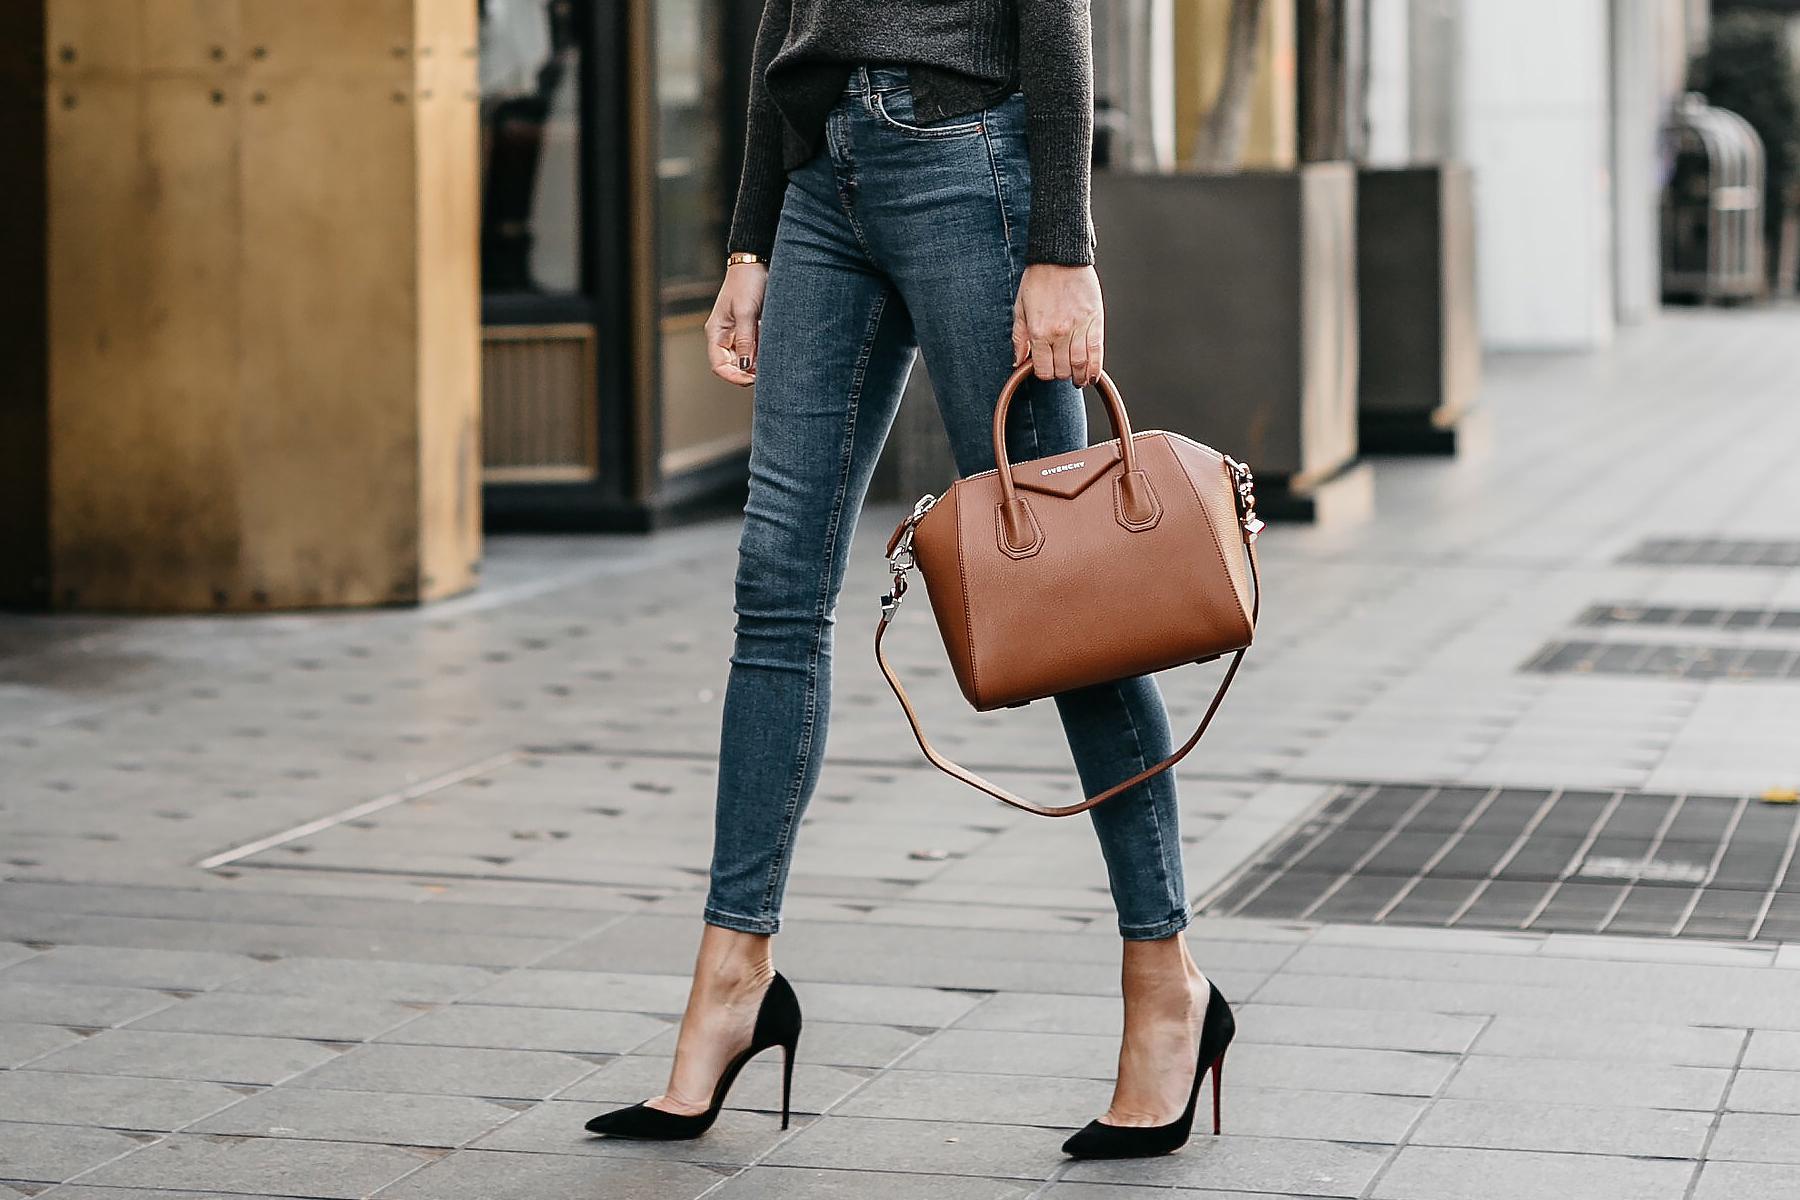 Givenchy Antigona Cognac Handbag Denim Skinny Jeans Black Pumps Fashion Jackson Dallas Blogger Fashion Blogger Street Style